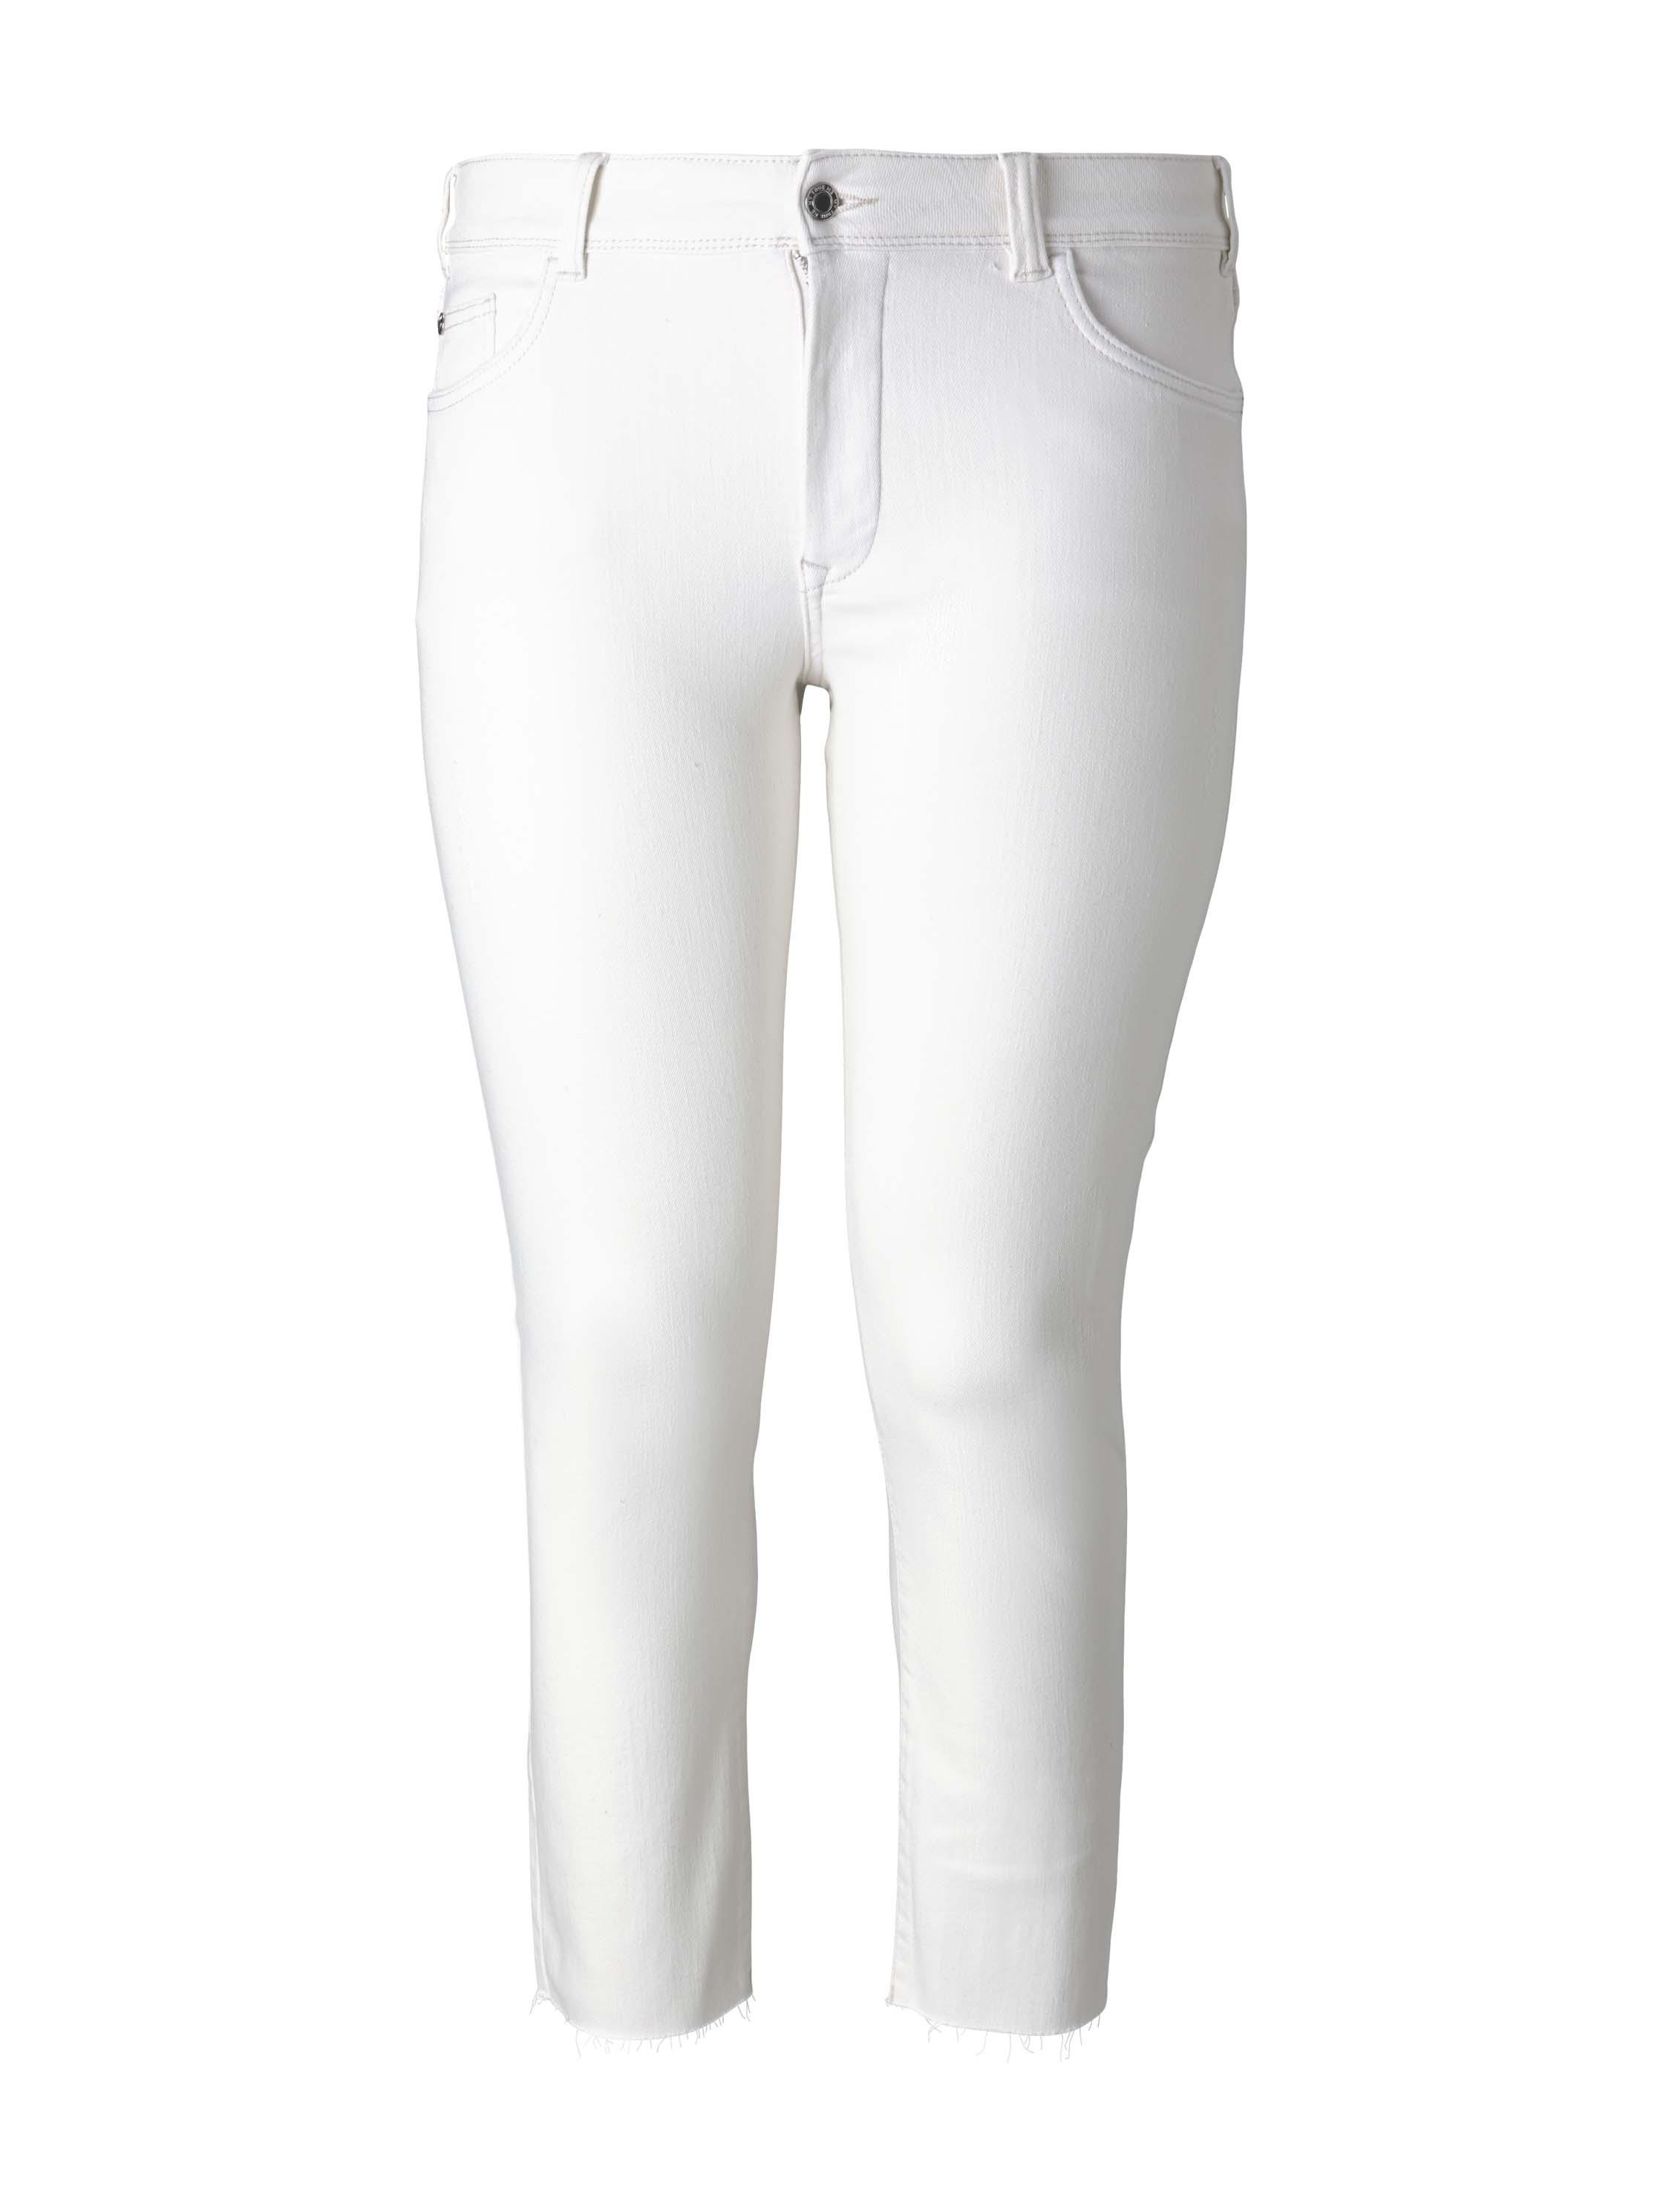 Damen Jeans denim slim with effects